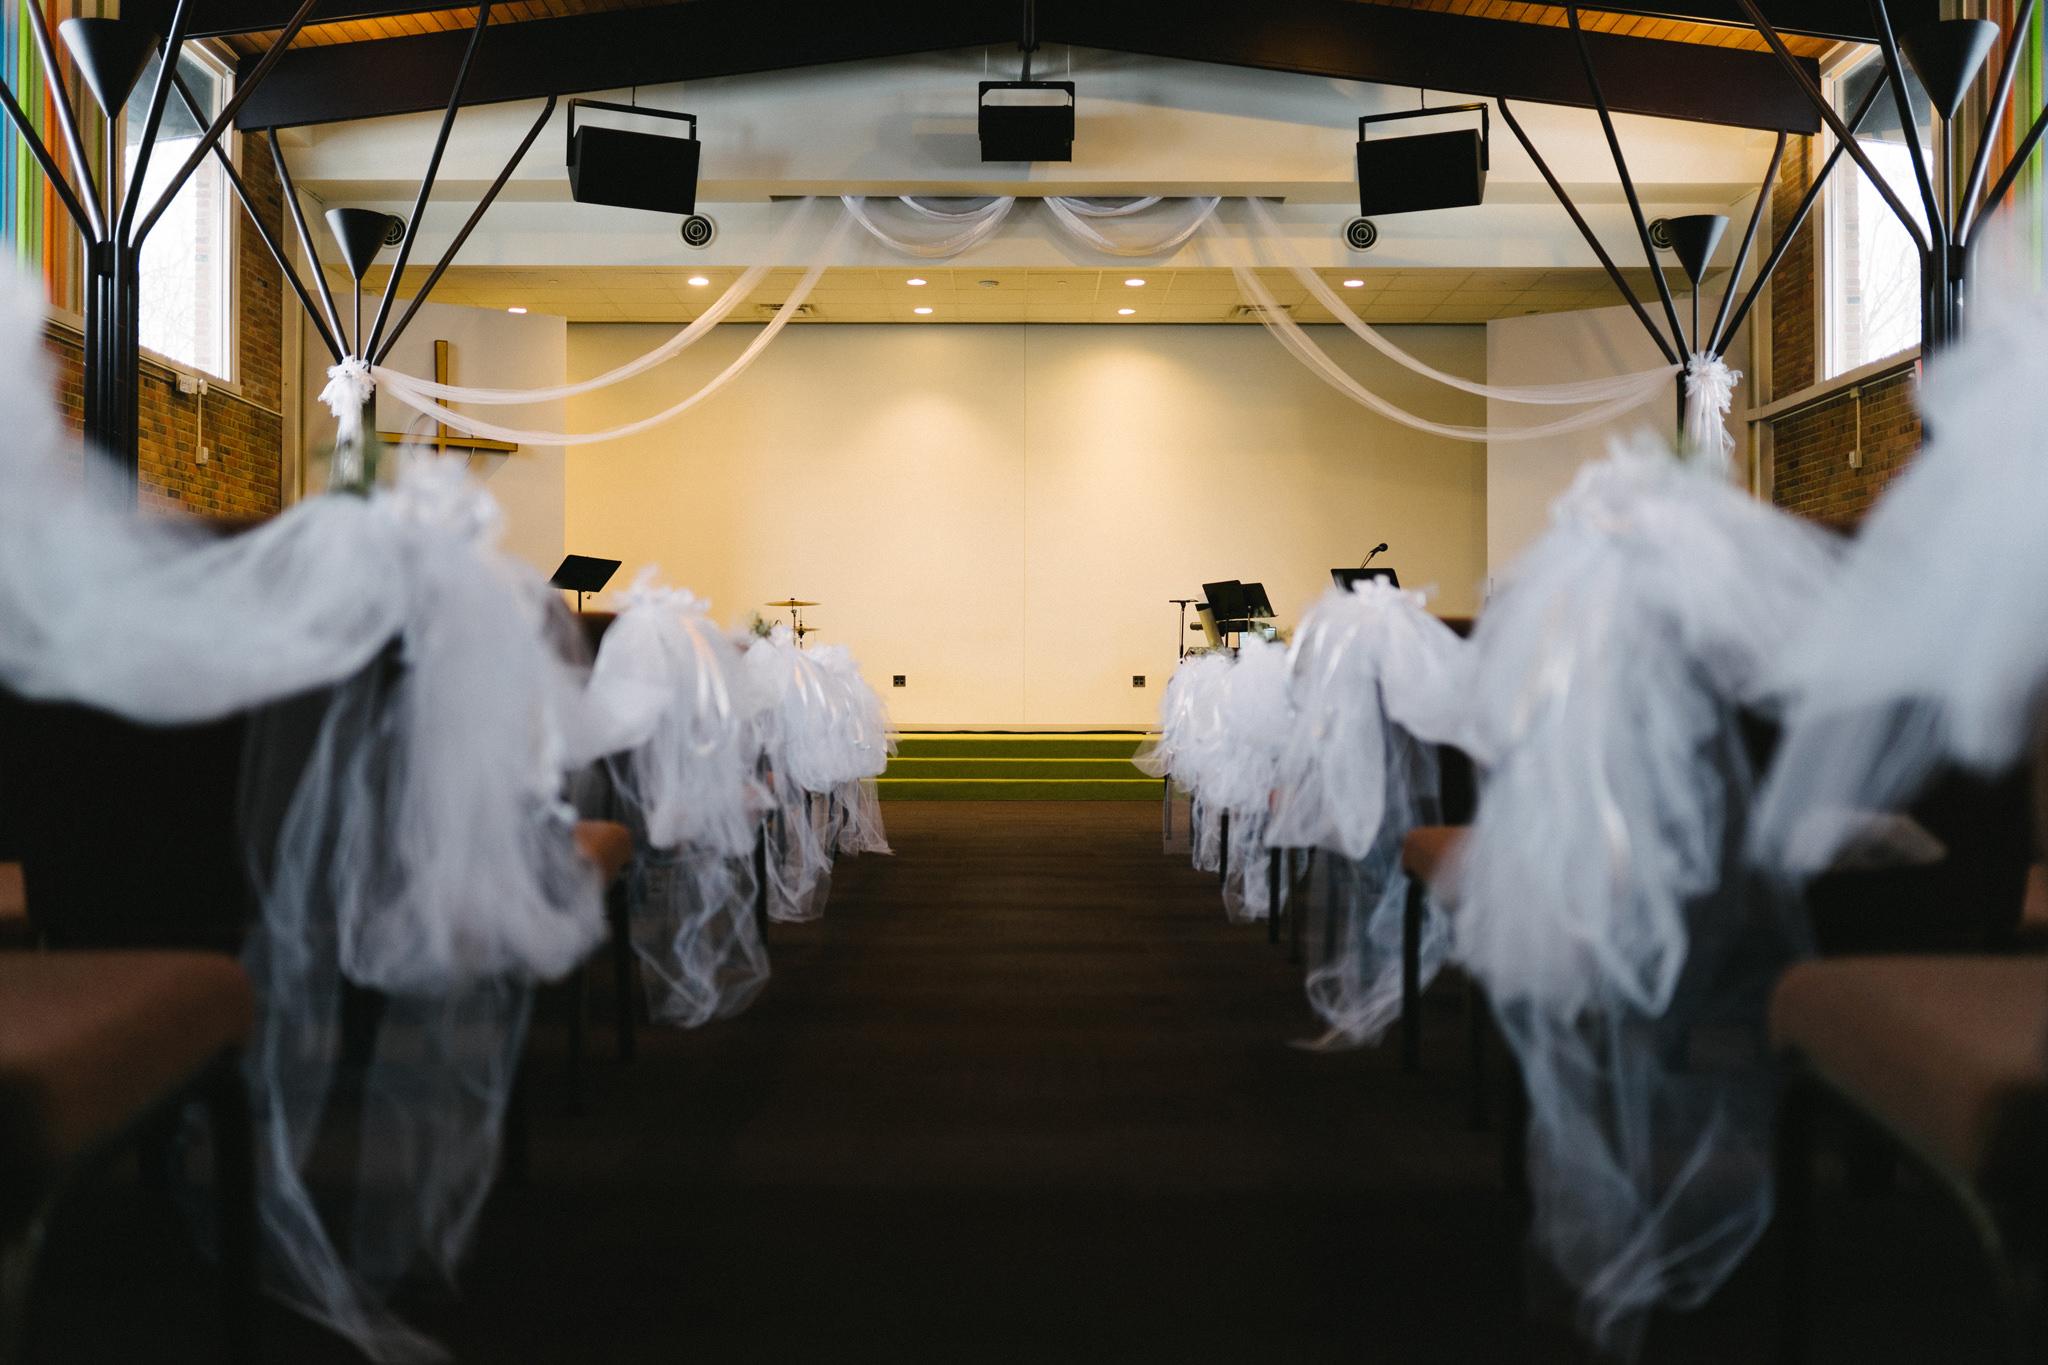 010-rempel-photography-chicago-wedding-inspiration-susan-daniel-michigan-metro-detroit-christian-church-holly-vault-cupcakes-and-kisses.jpg